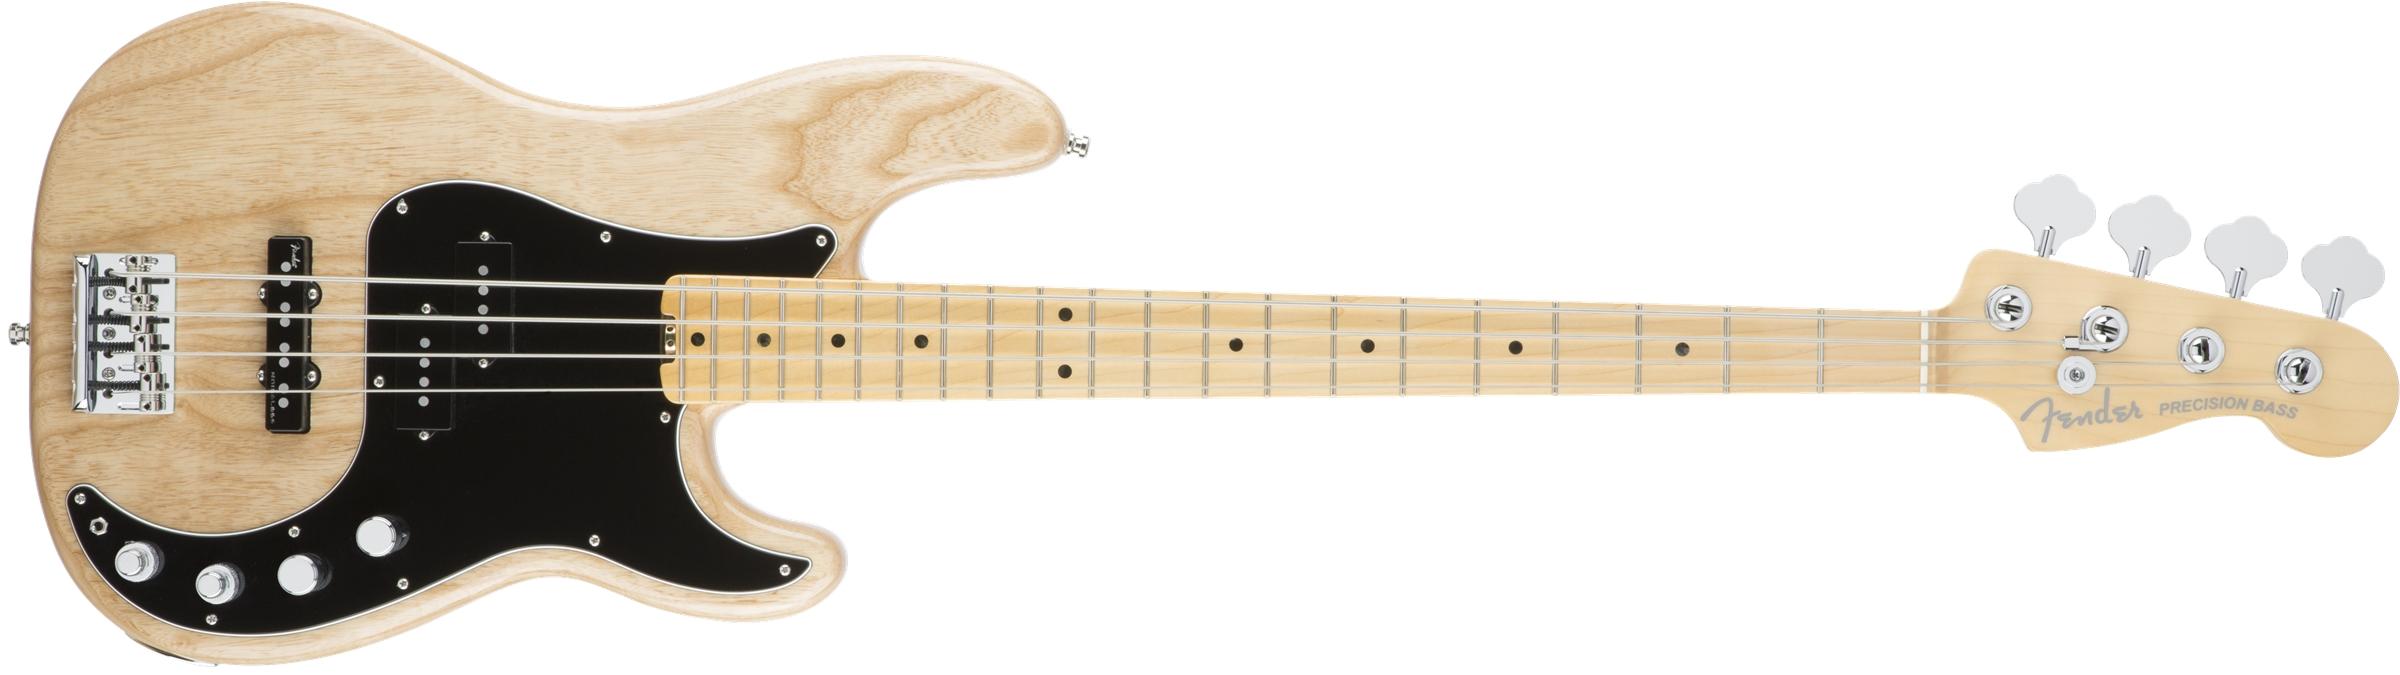 Fender American Elite Precision Bass 174 Ash Maple